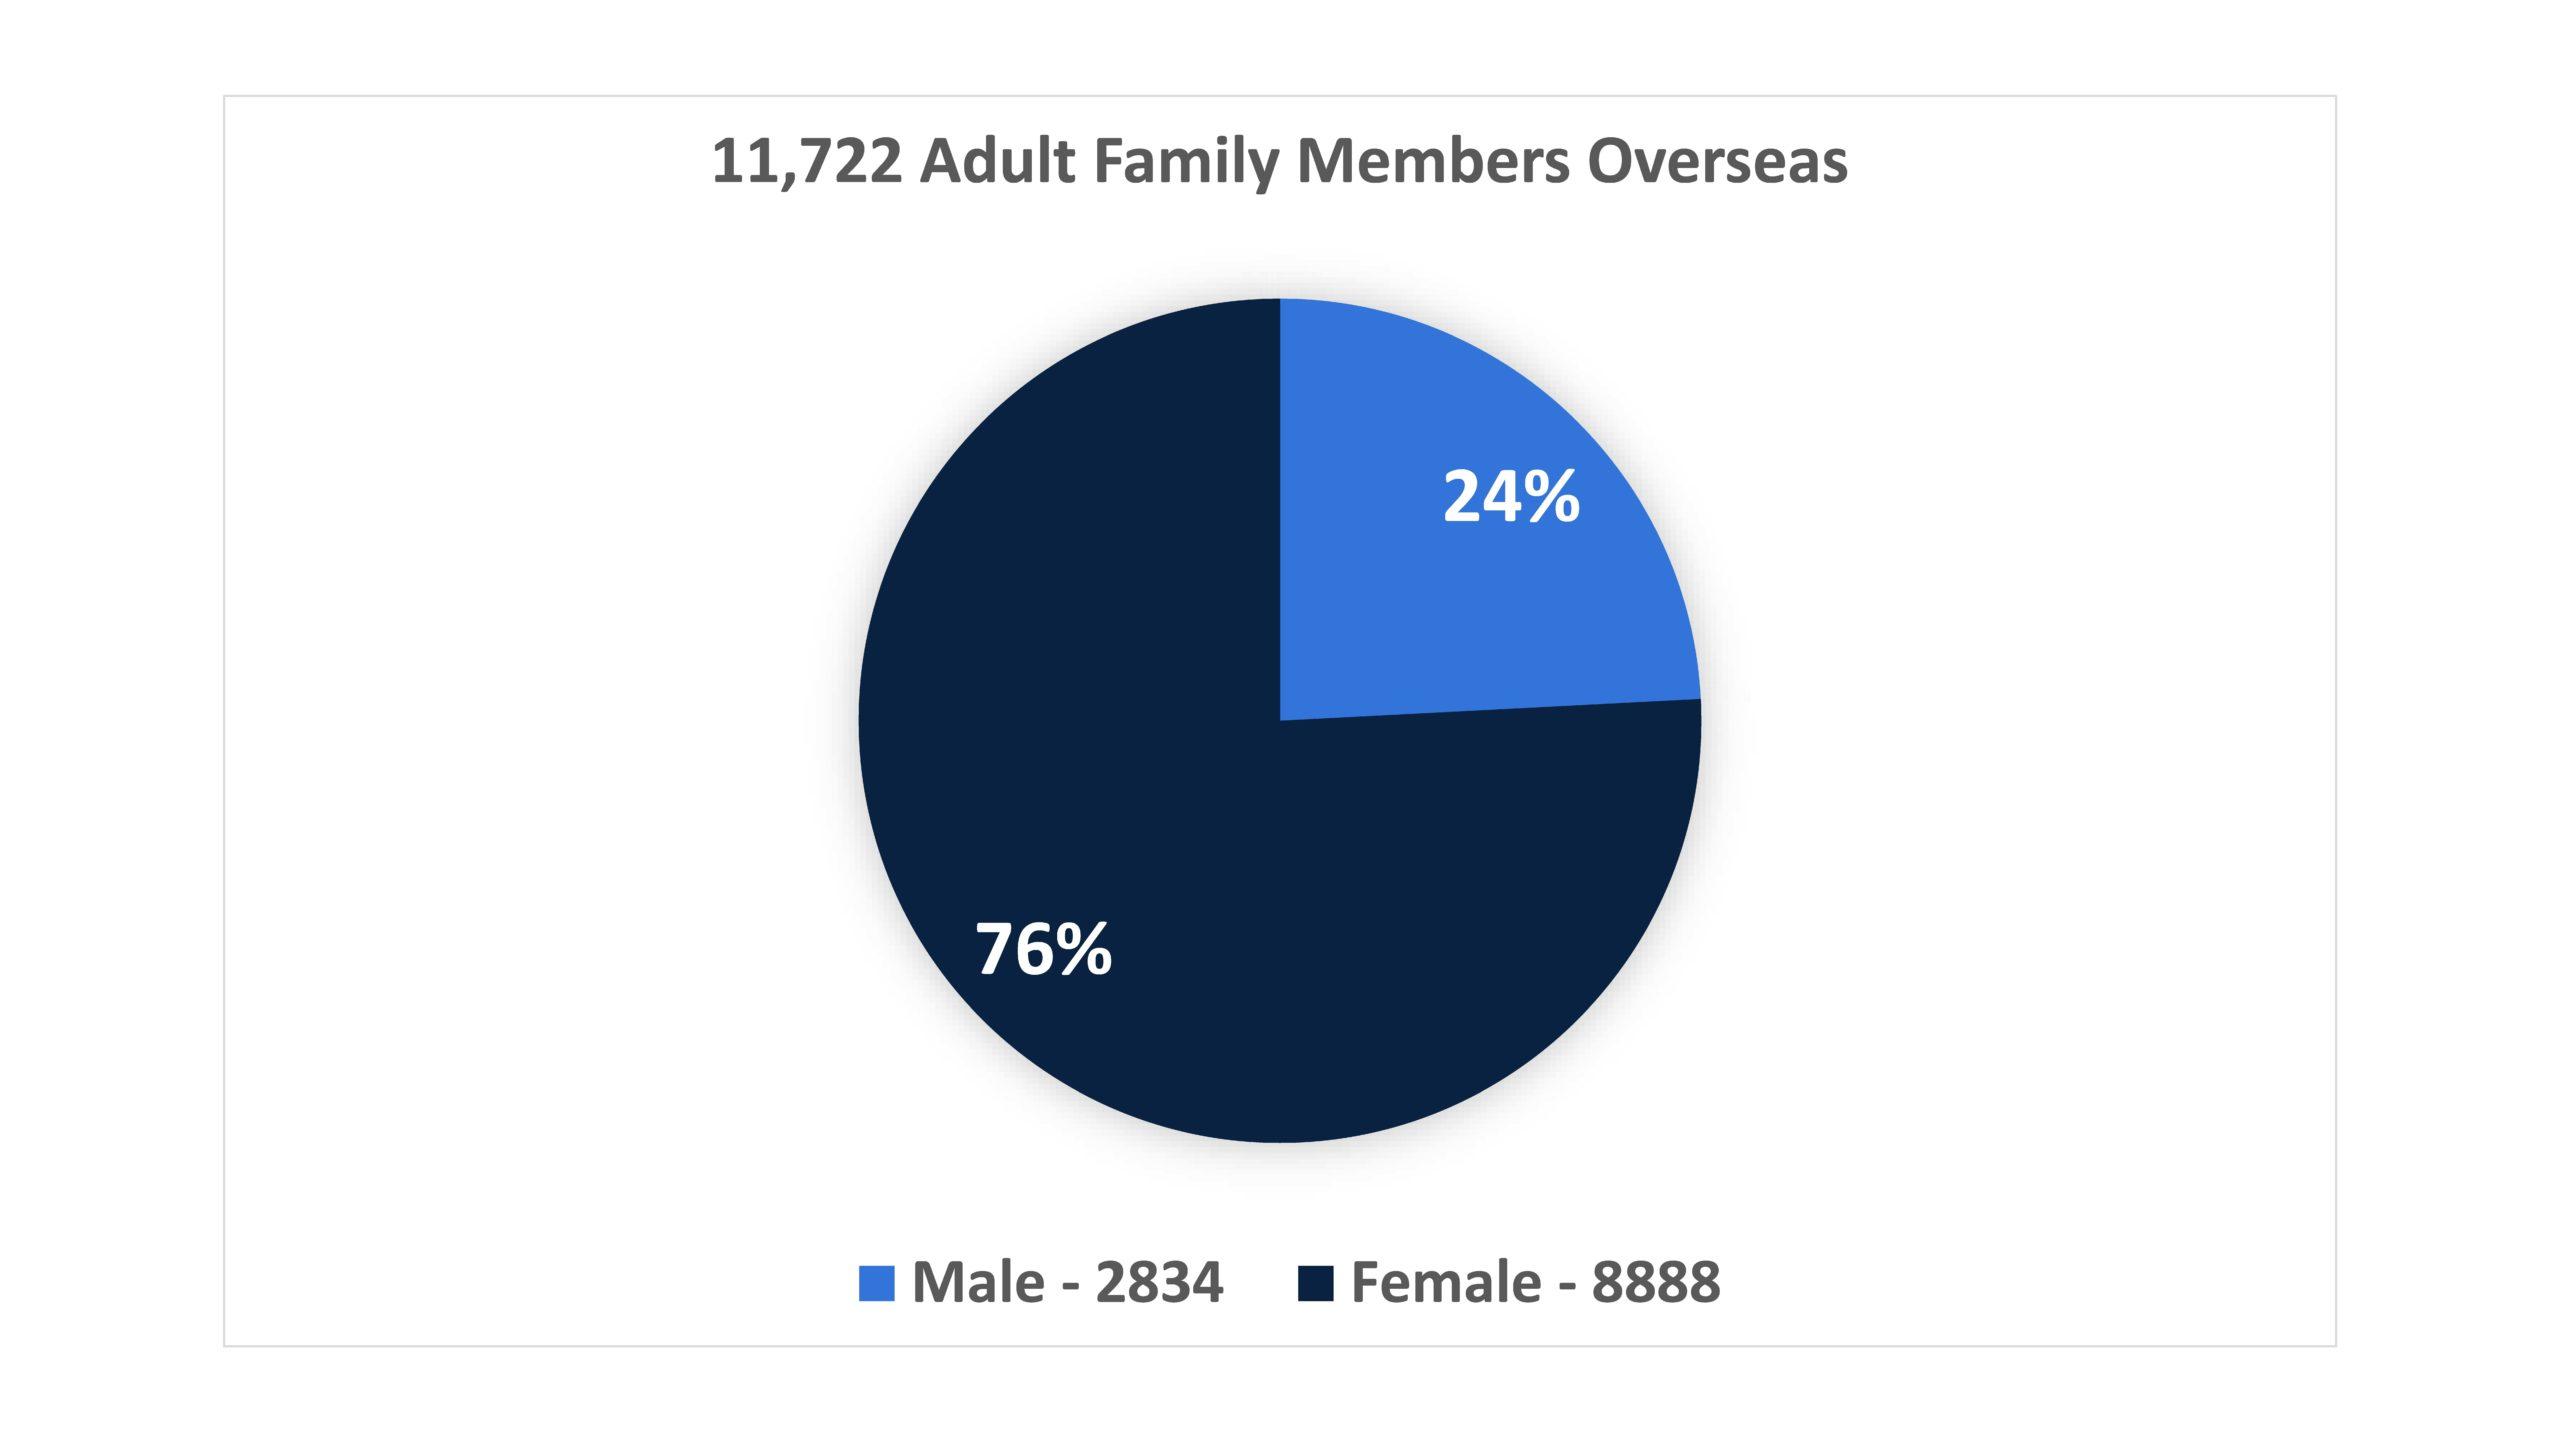 11,722 Adult Family Members Overseas